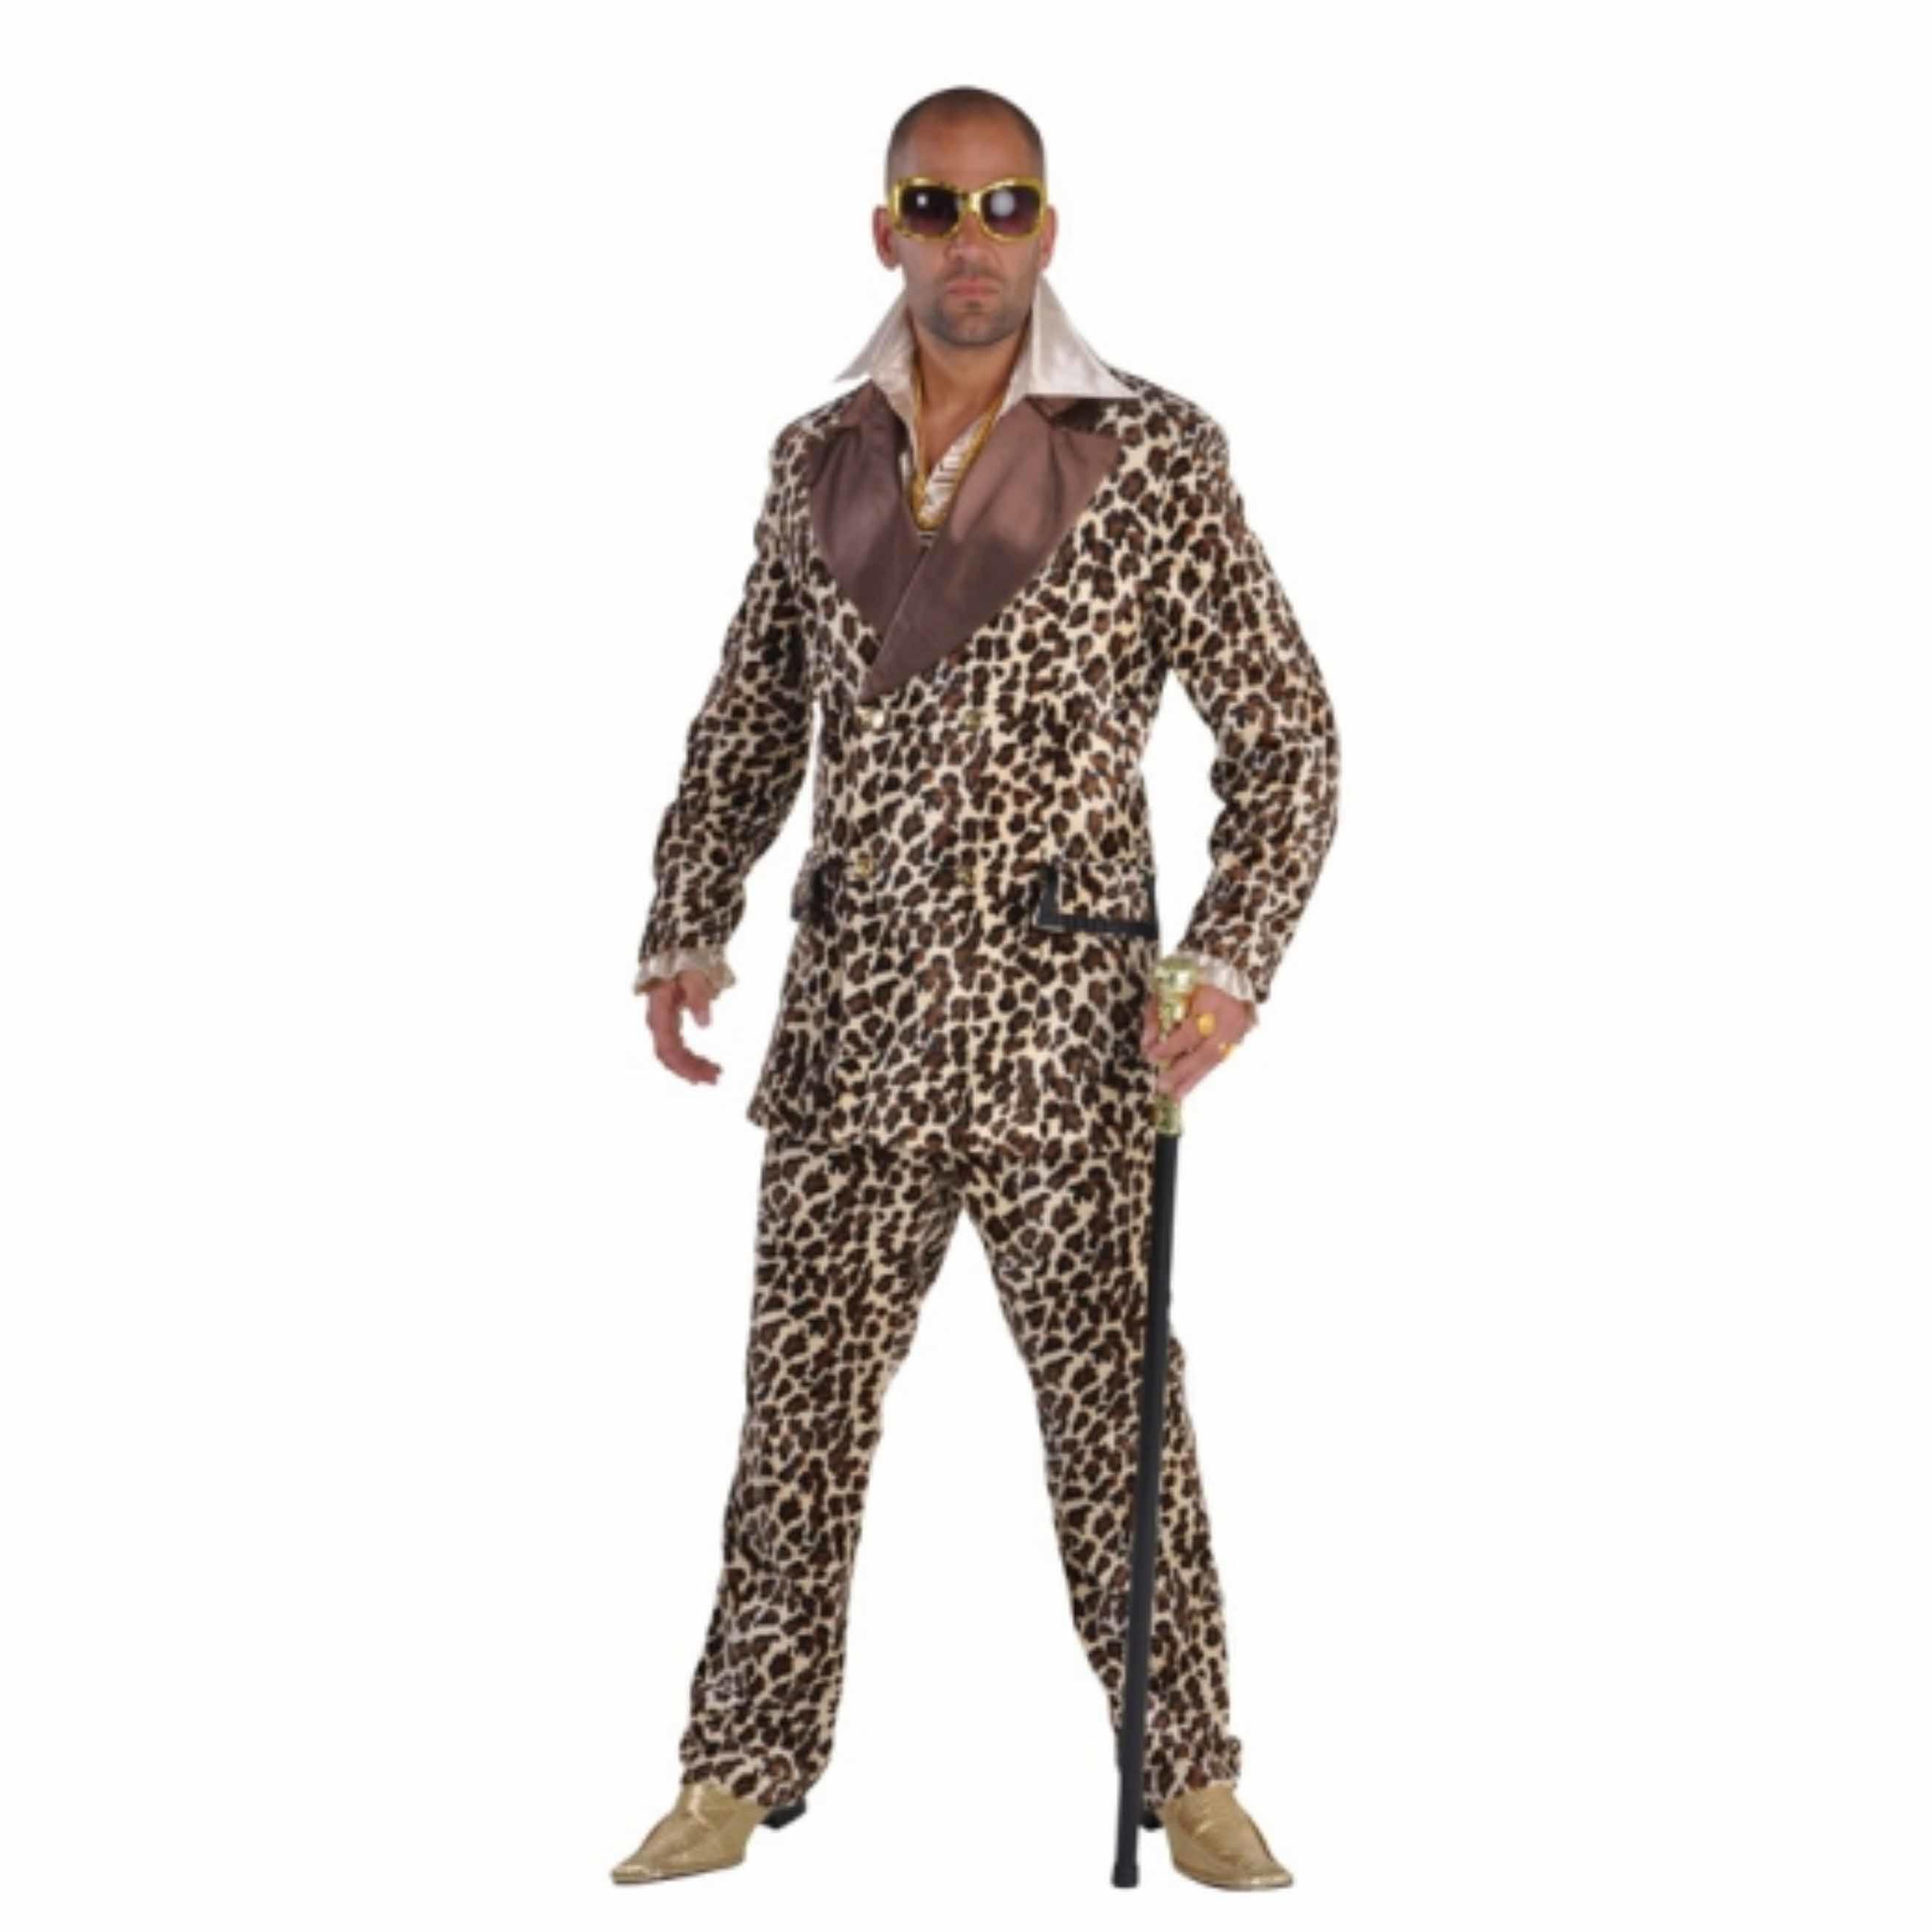 Luxe pimp kostuum met luipaardprint